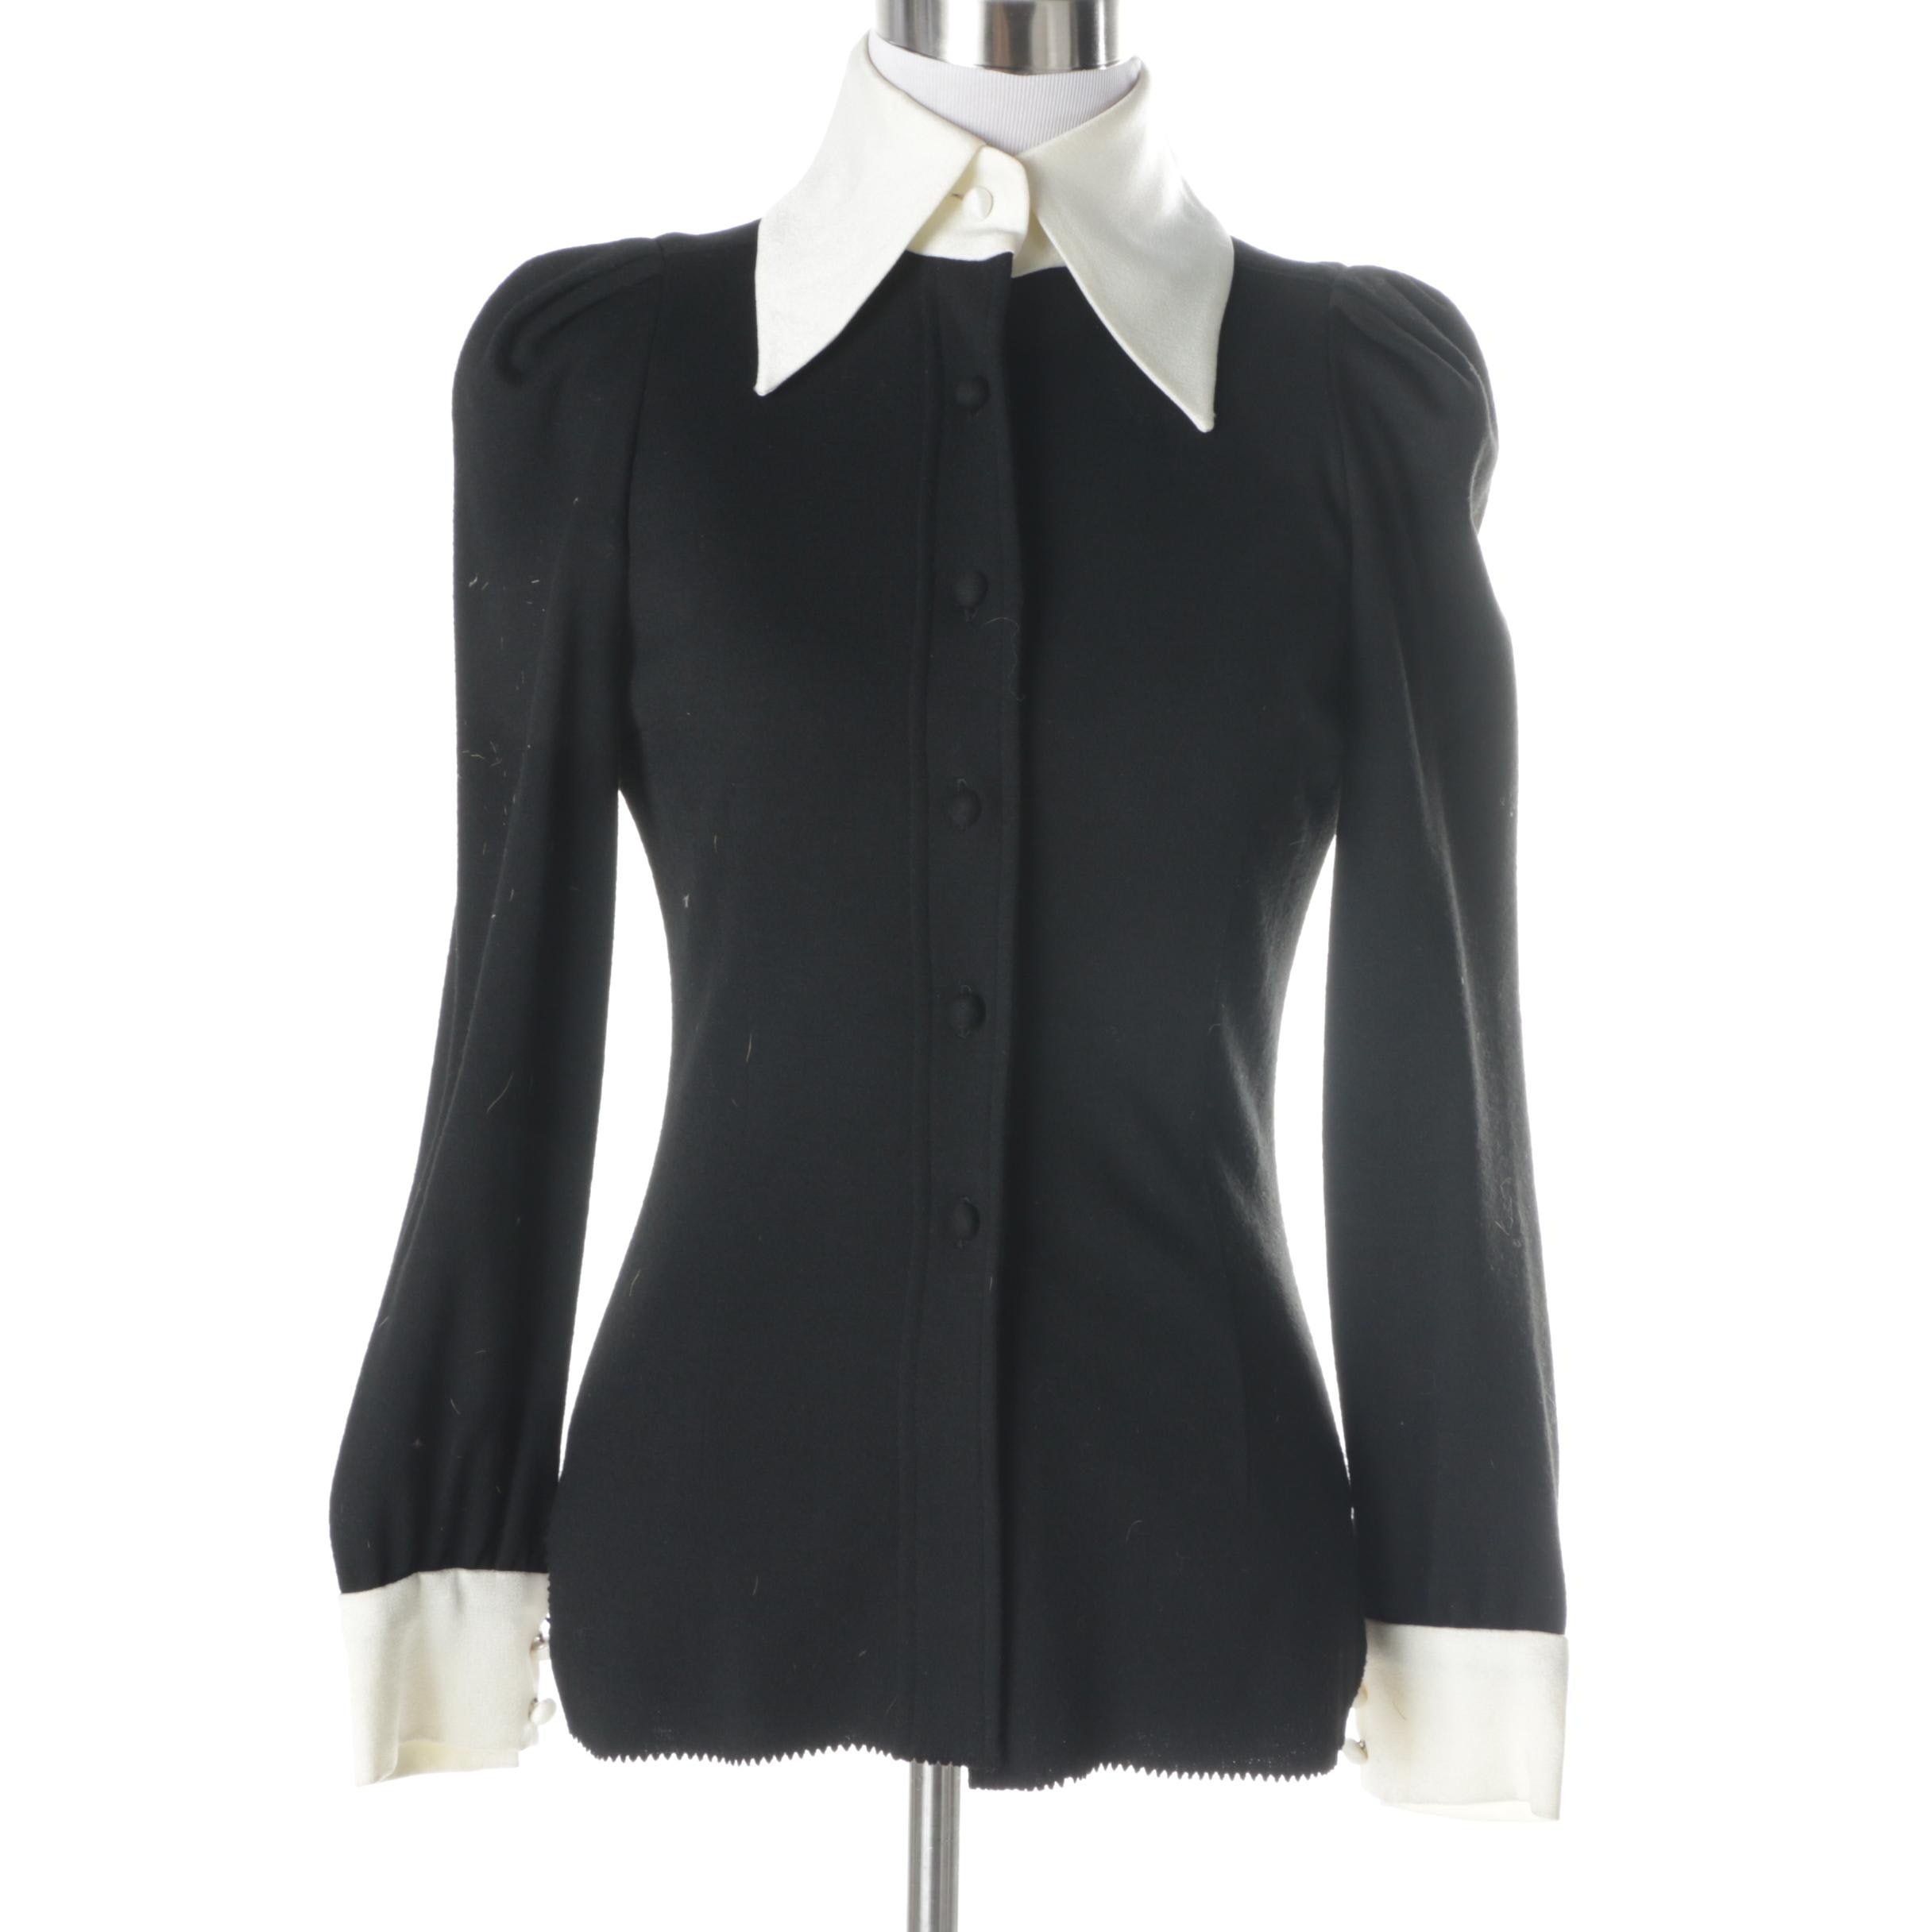 Women's Vintage Cardinali Sweater